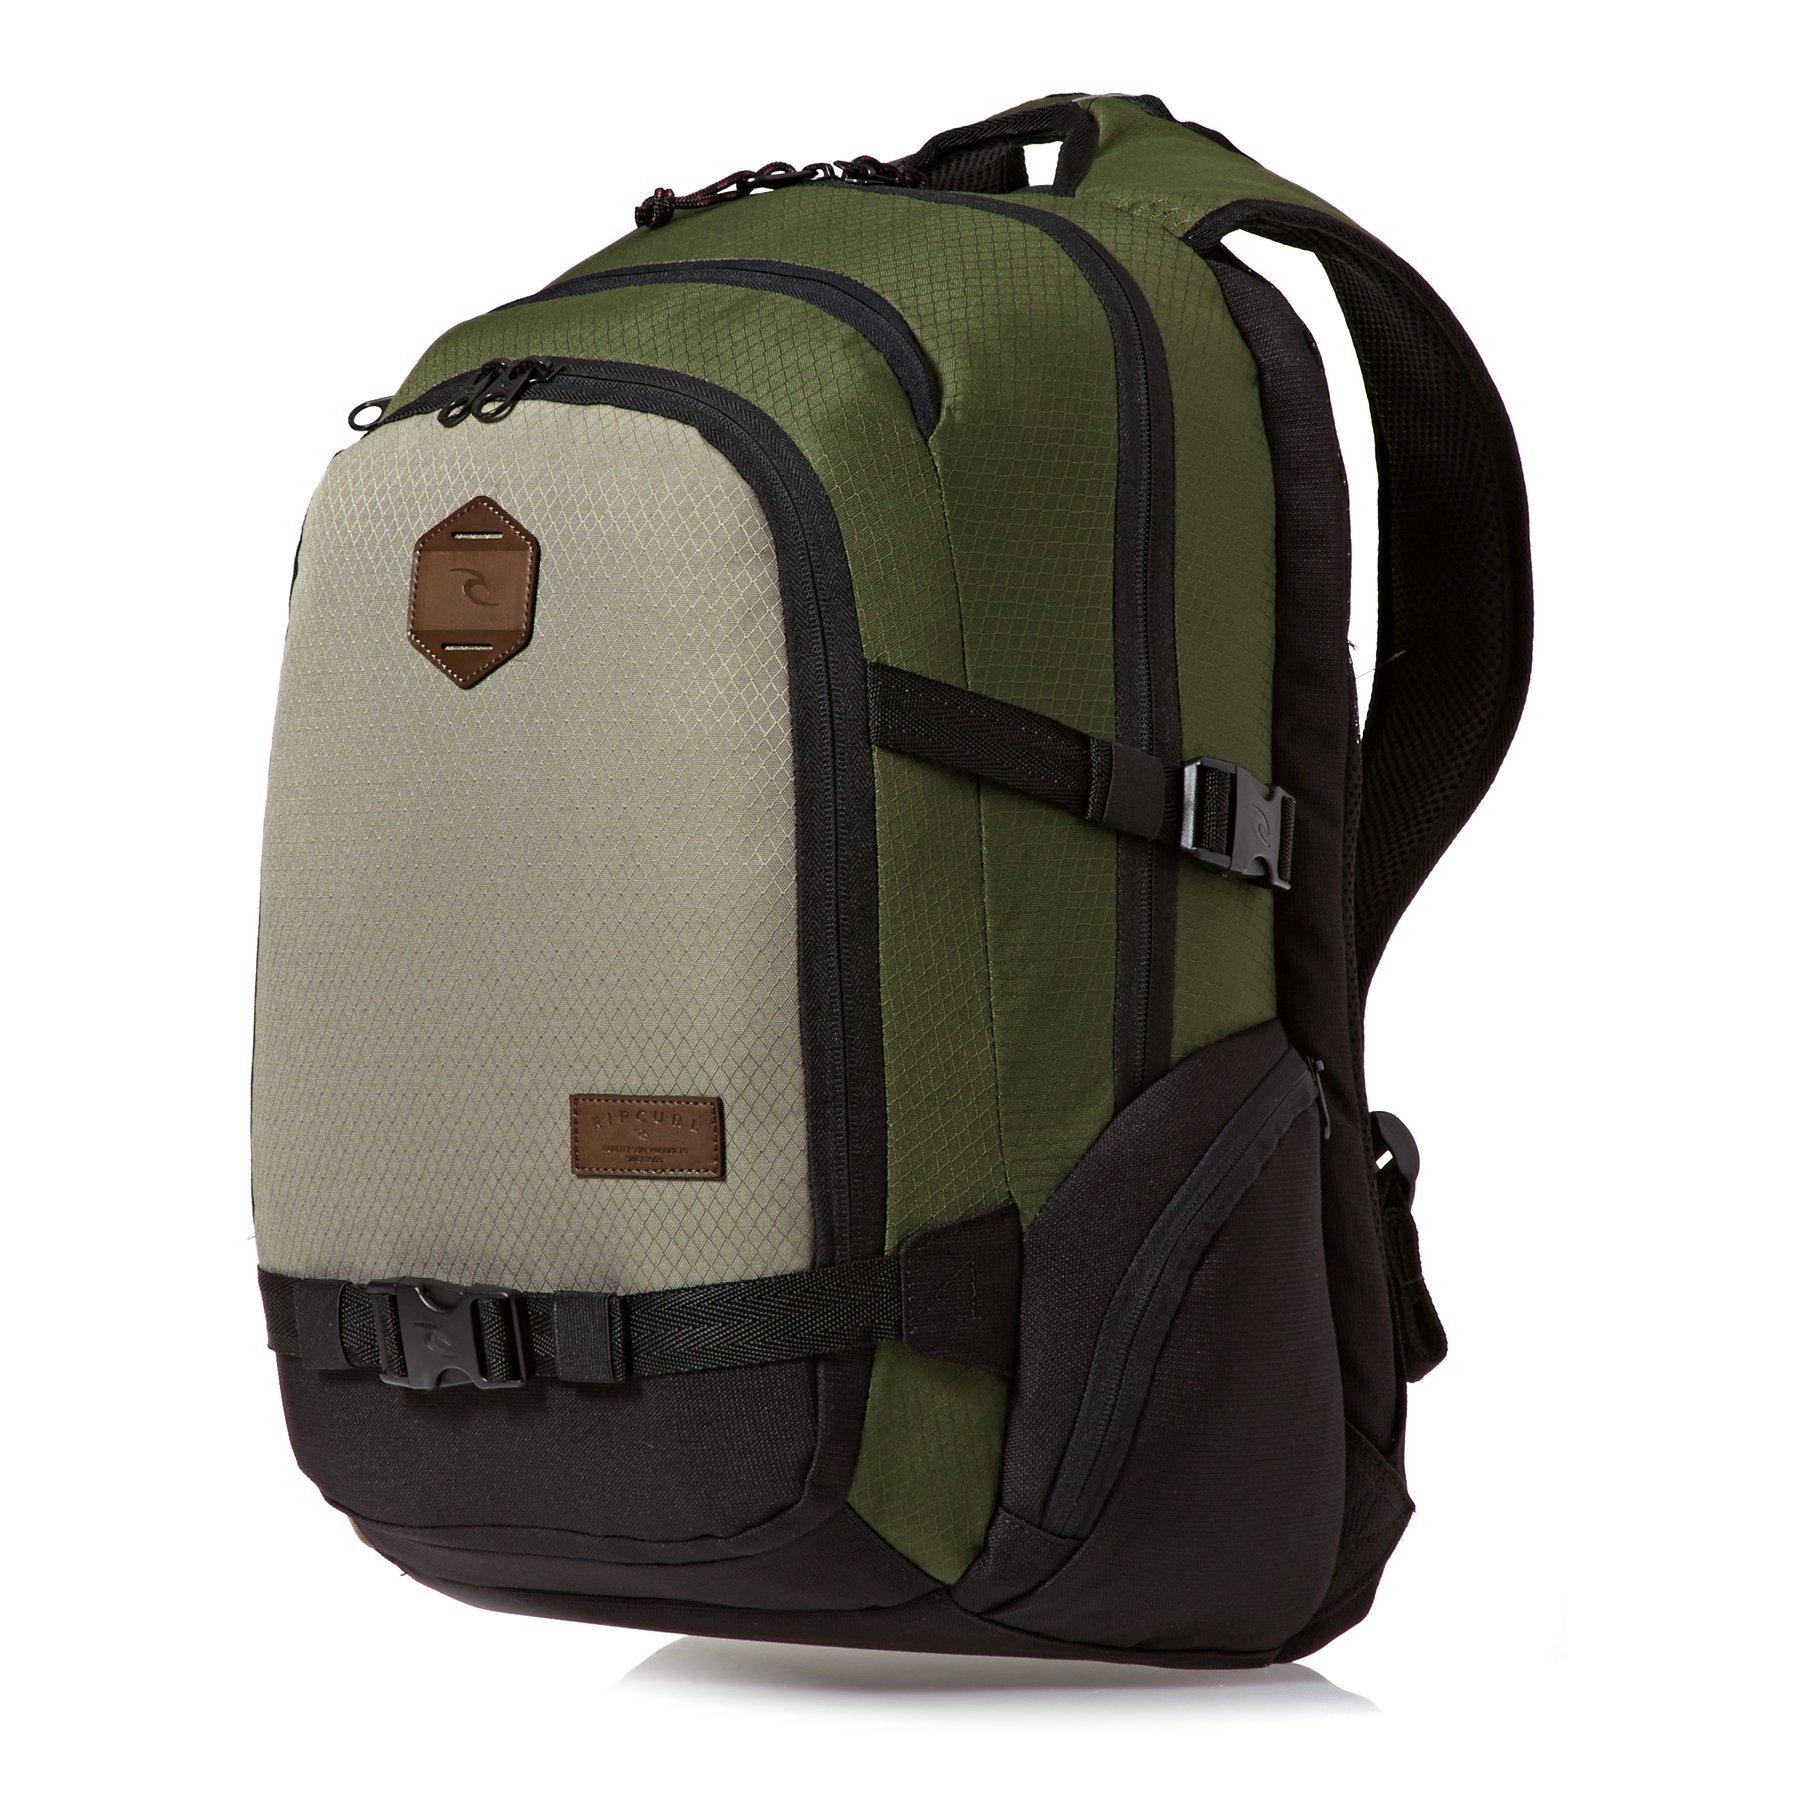 Rip Curl Posse Stacka Backpack in Khaki